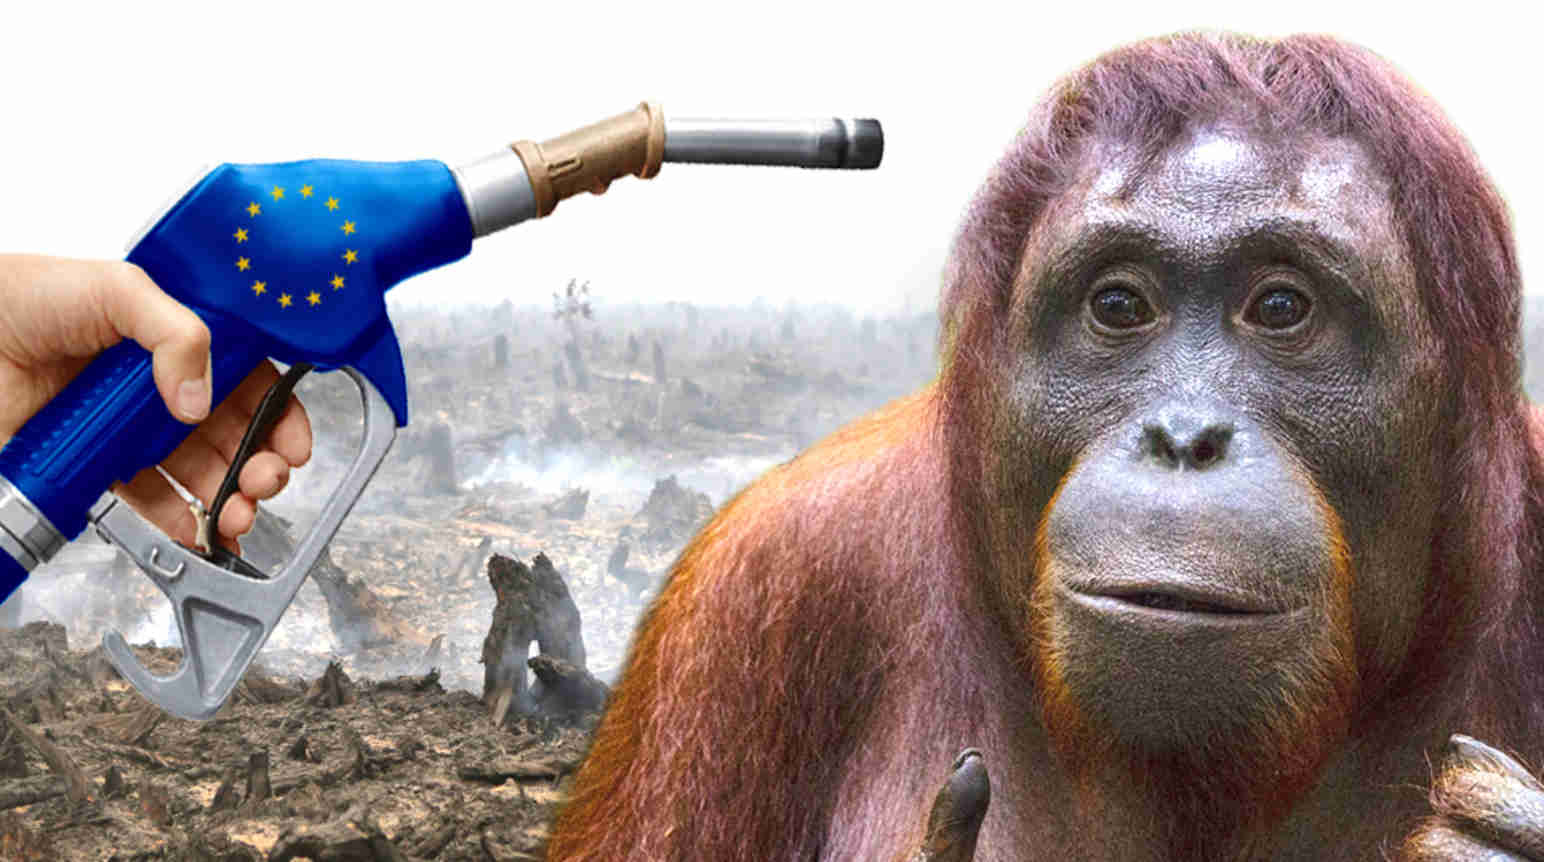 https://www.rainforest-rescue.org/uploads/photos/article/wide/xl/x2/eu-biosprit-politik-zerstoert-regenwaelder-orang-utan.jpg